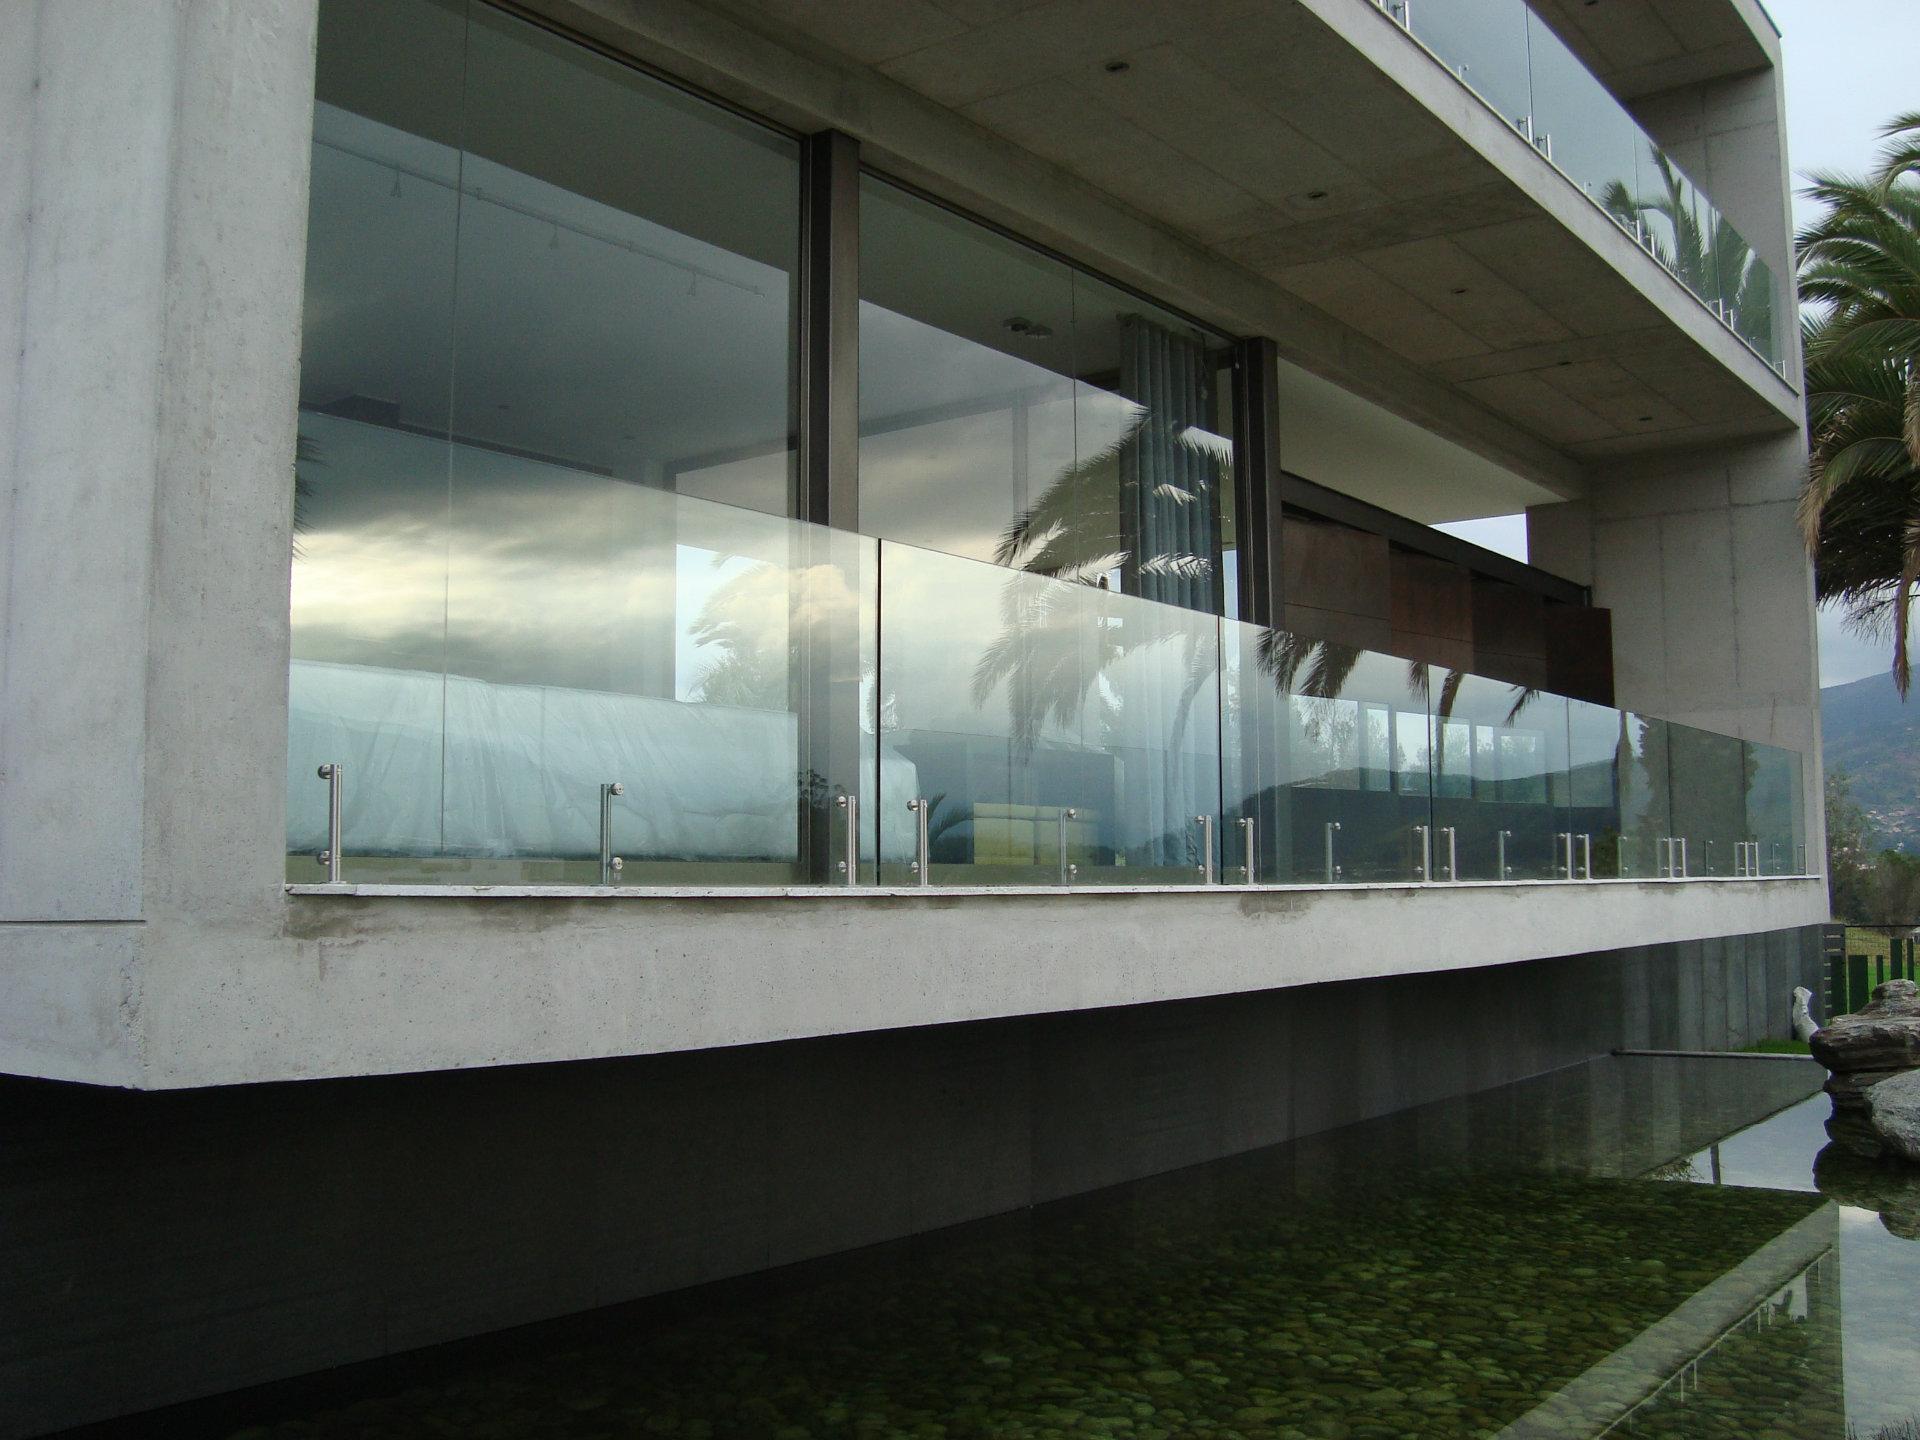 Pasamano vidrio templado  Metalmachine